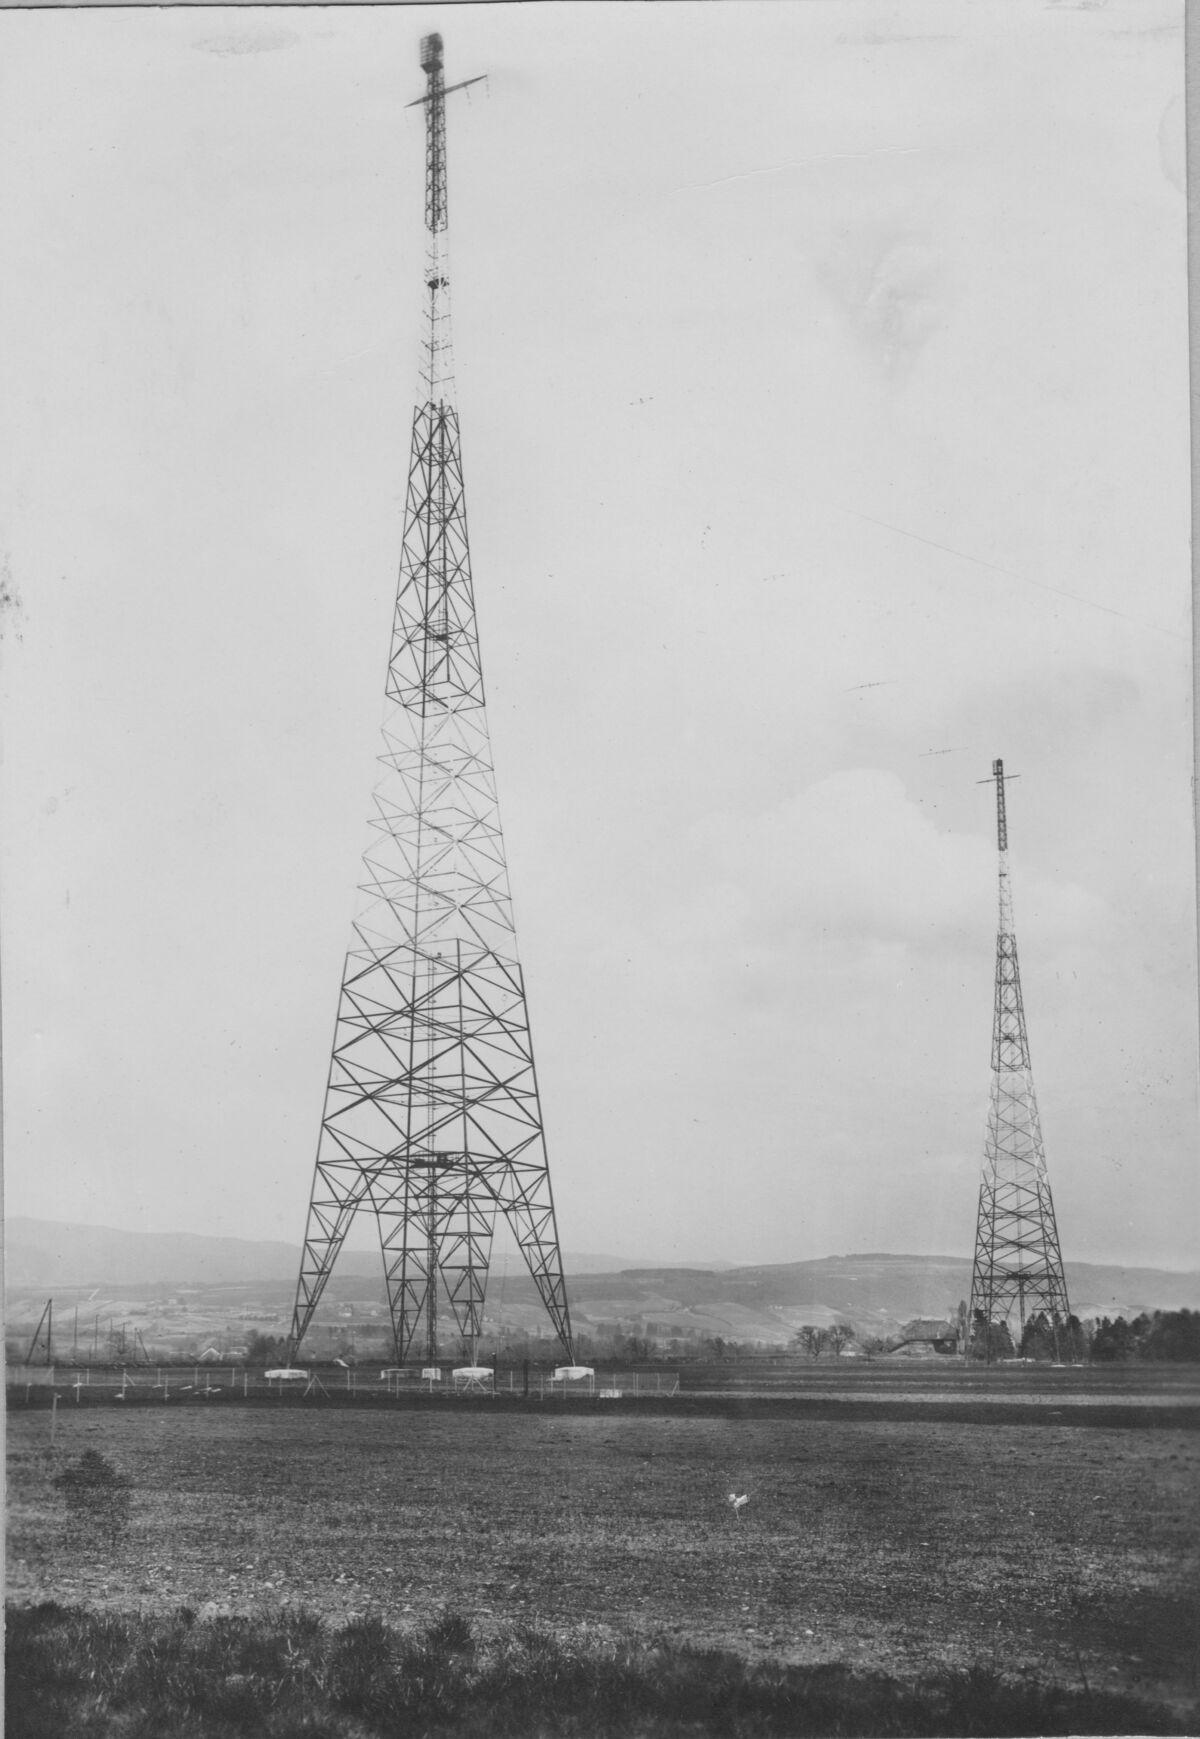 GFA 20/135.165: Stahl- und Brückenbau: Antennentürme